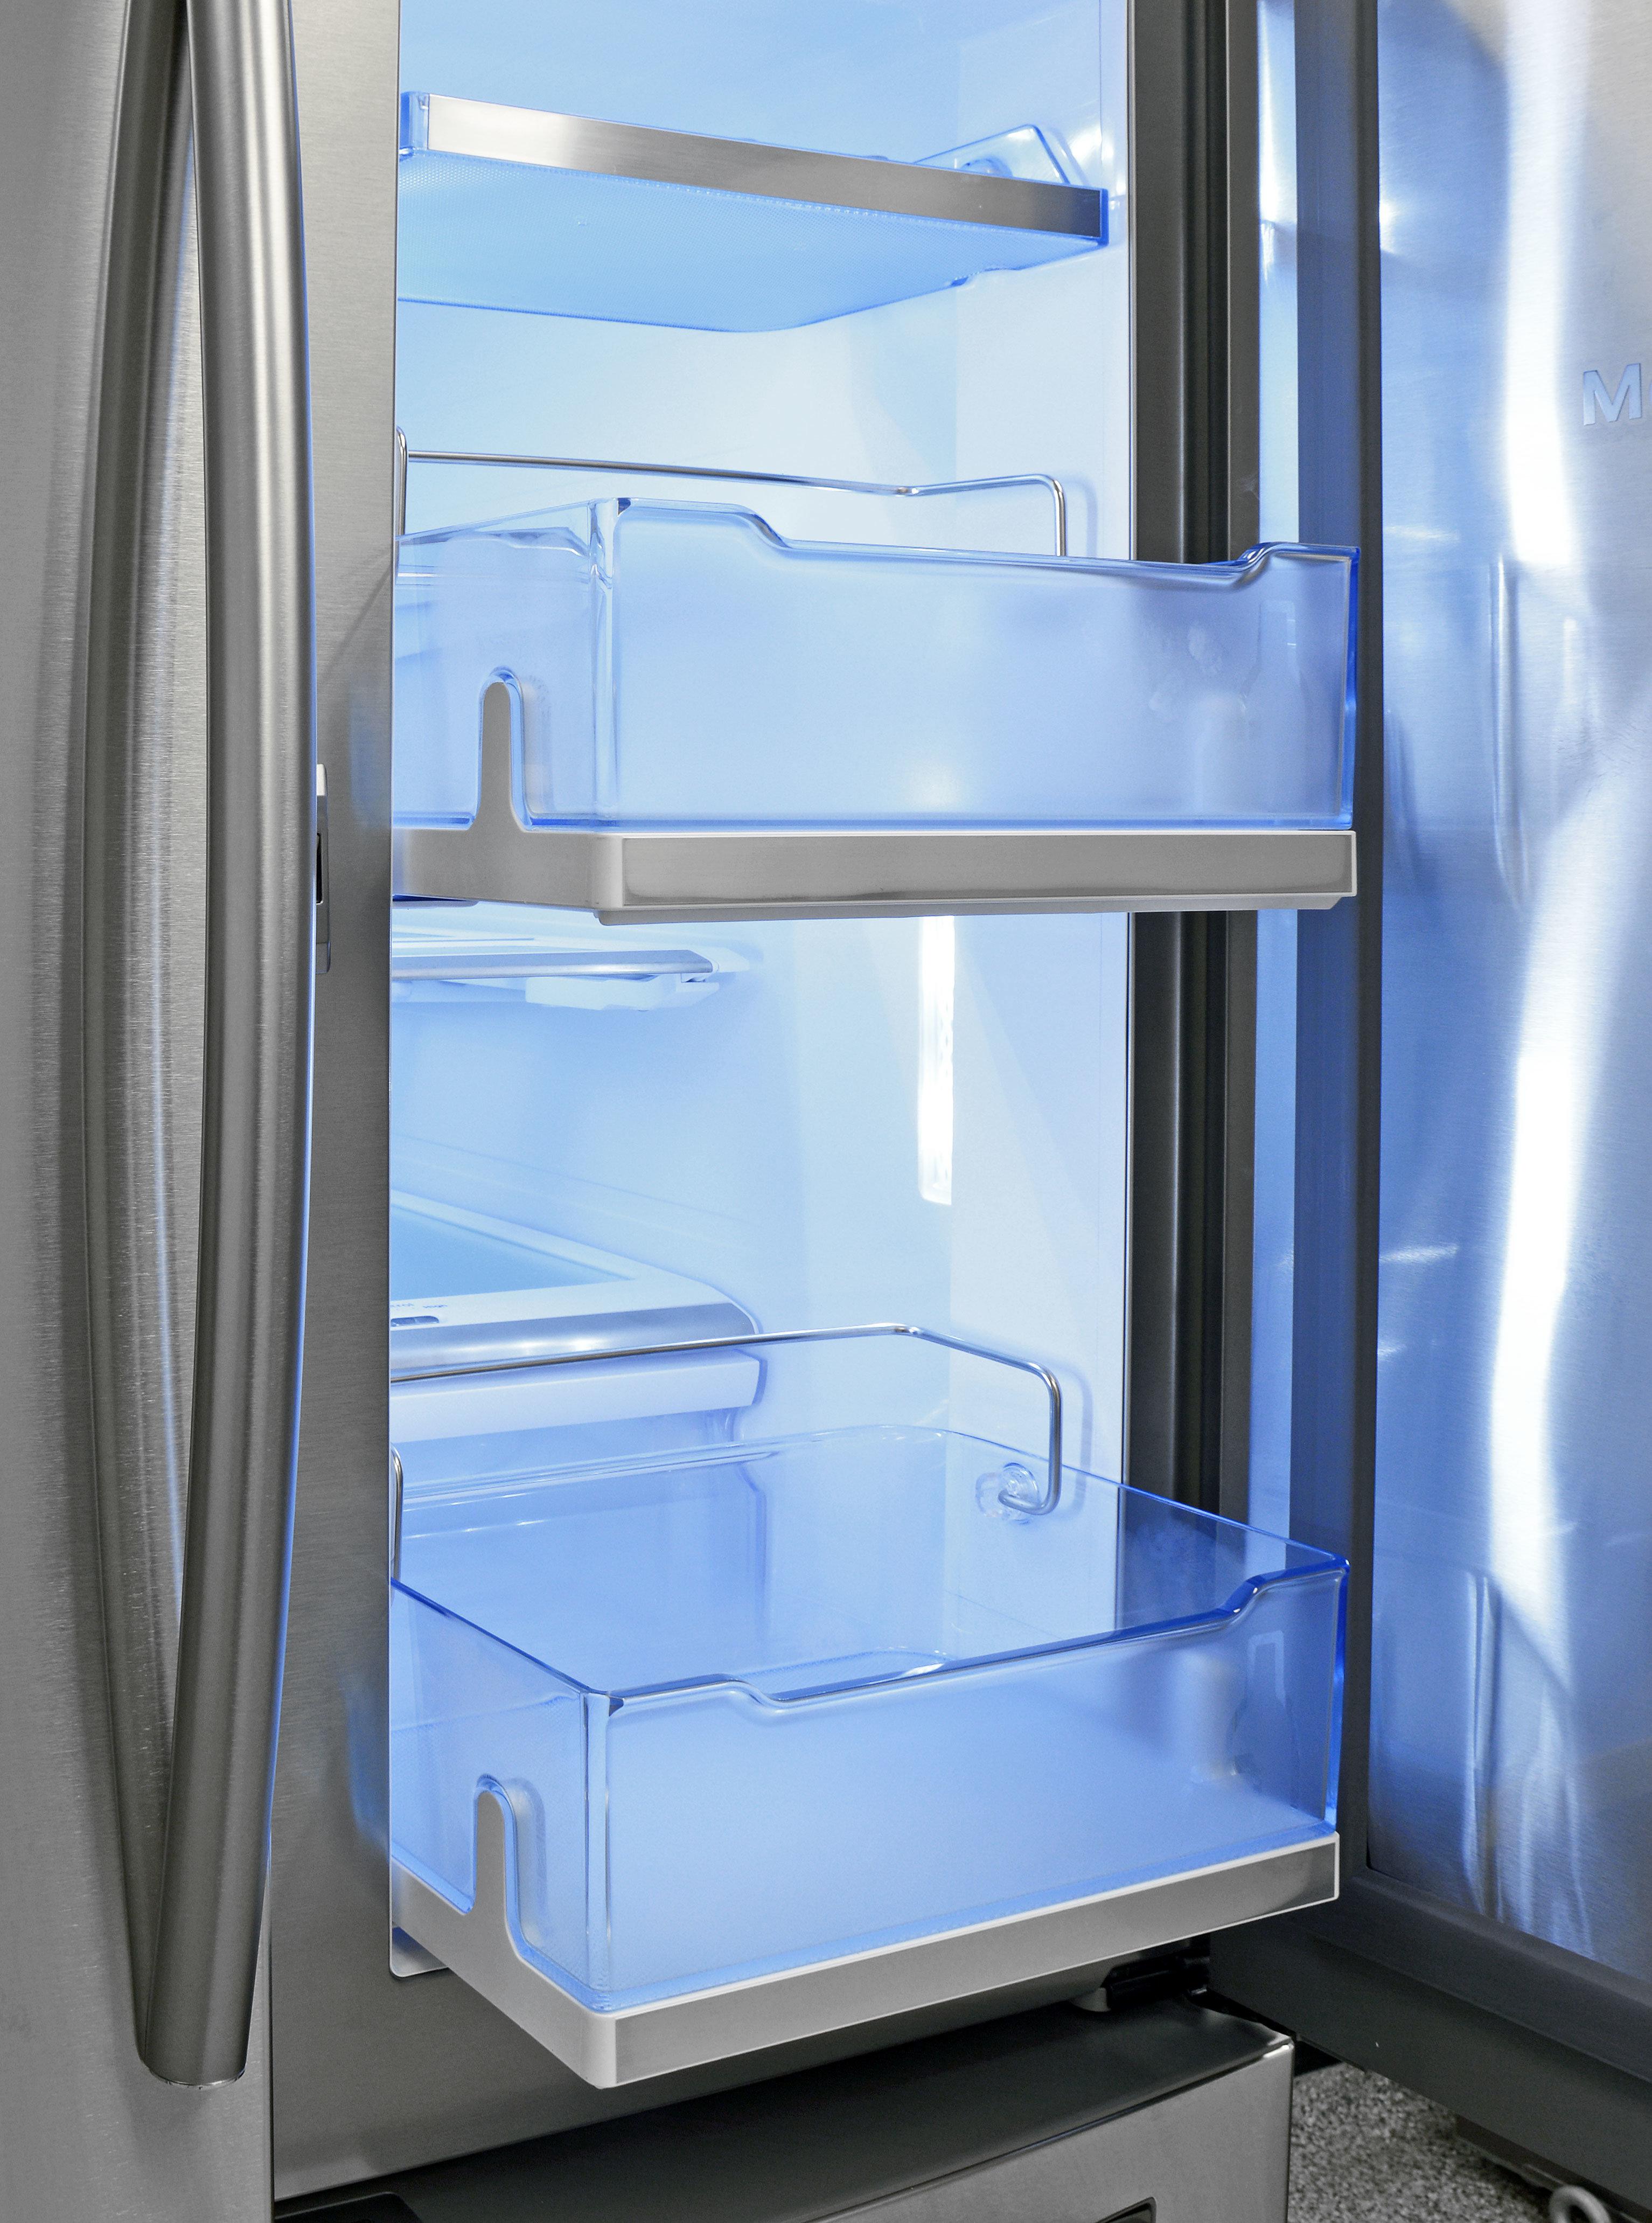 Samsung Rf30hbedbsr Refrigerator Review Reviewed Com